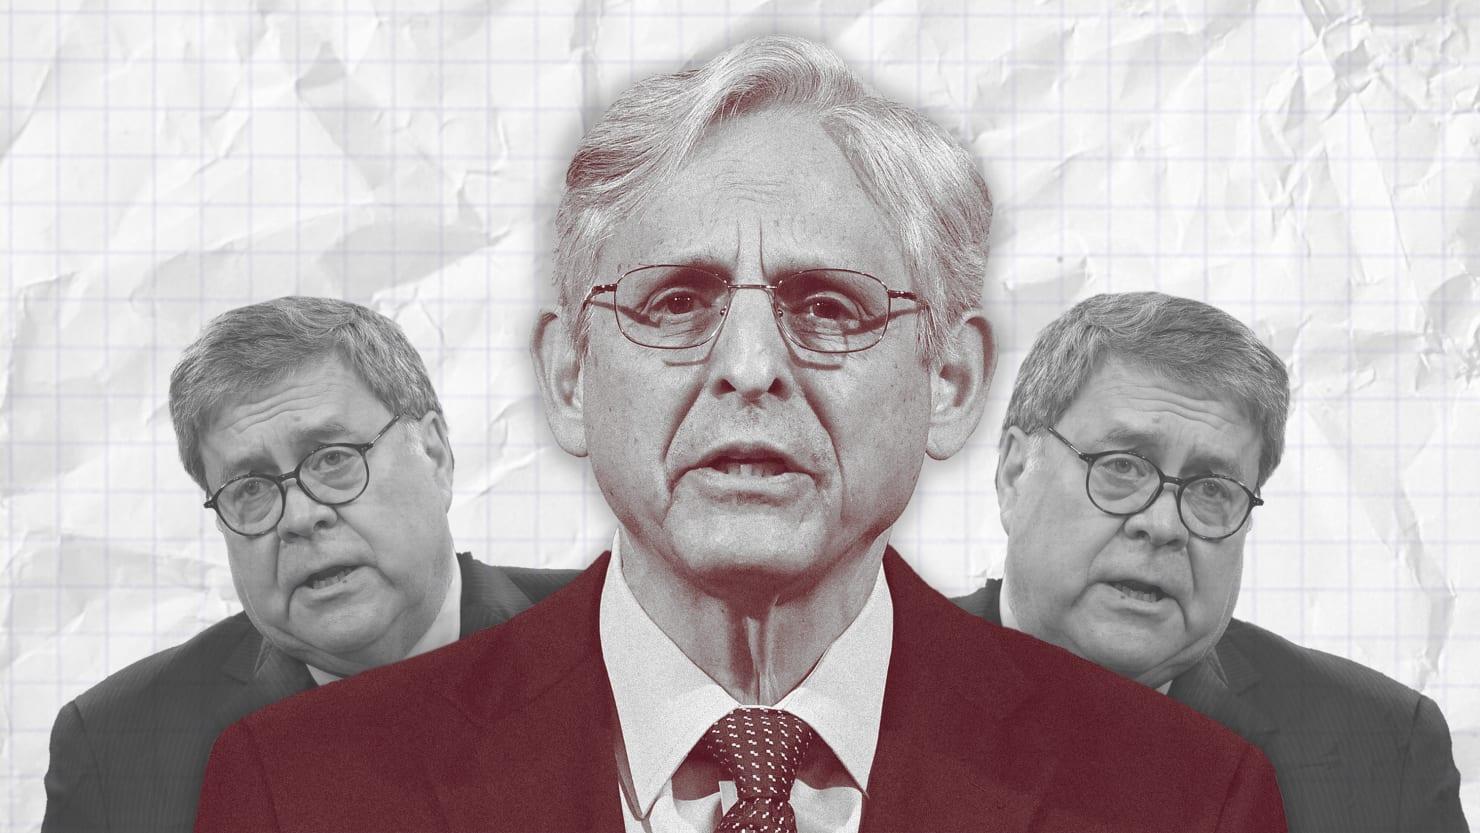 Bill Barr's Still Making a Mockery of Justice. Merrick Garland's Letting Him.